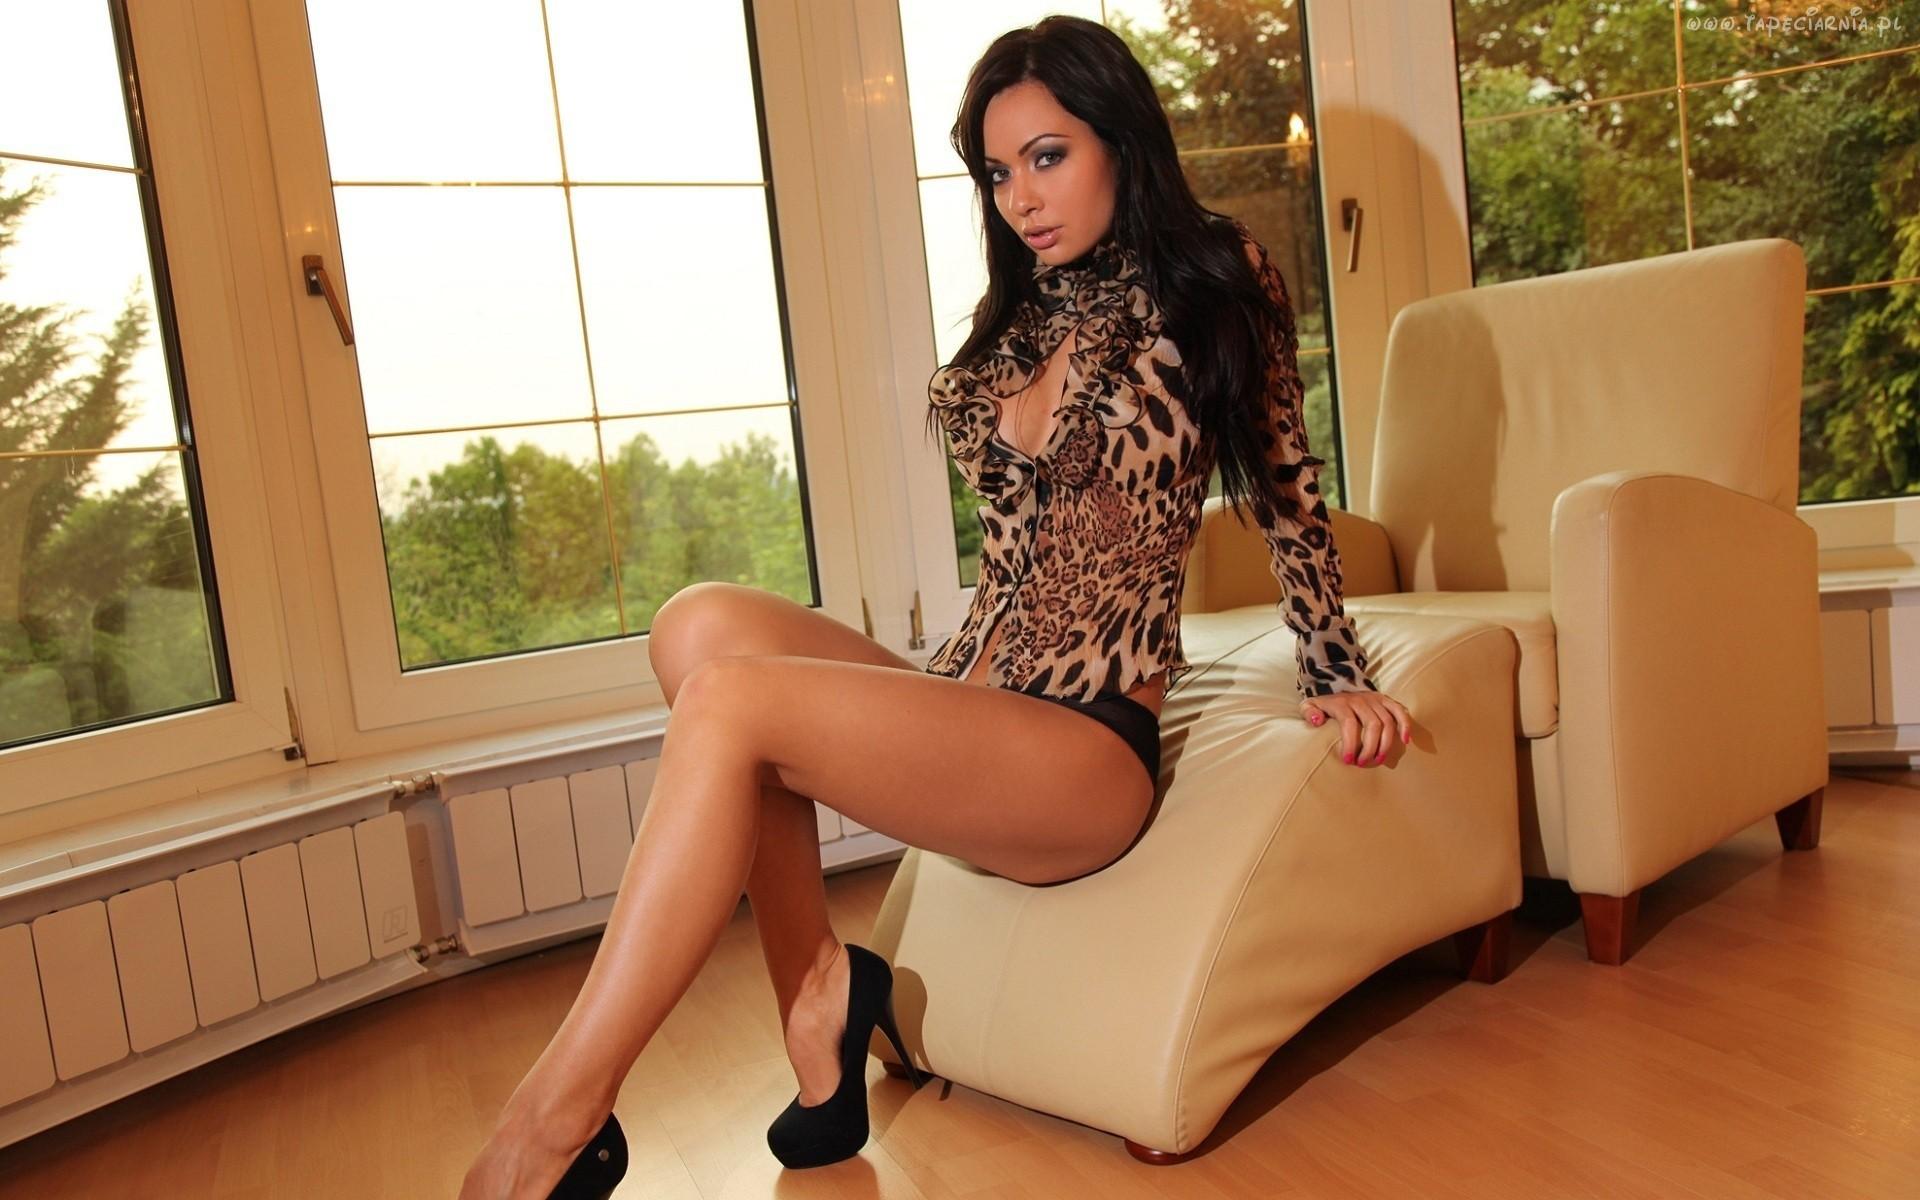 Beautiful solo girl Mira Sunset removing high heels from stocking attired feet № 628404 без смс